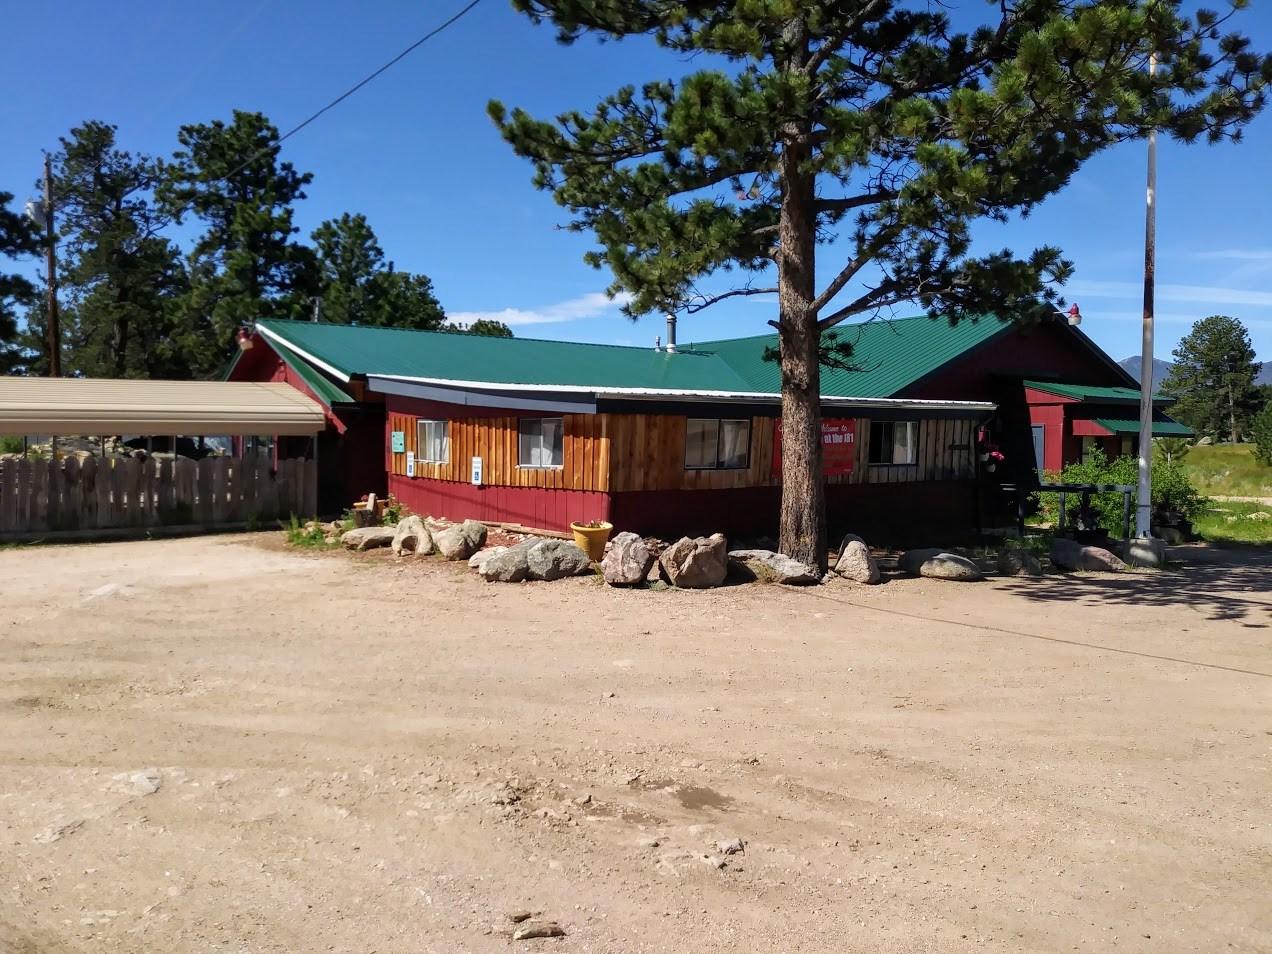 Colorado restaurant and bar for sale